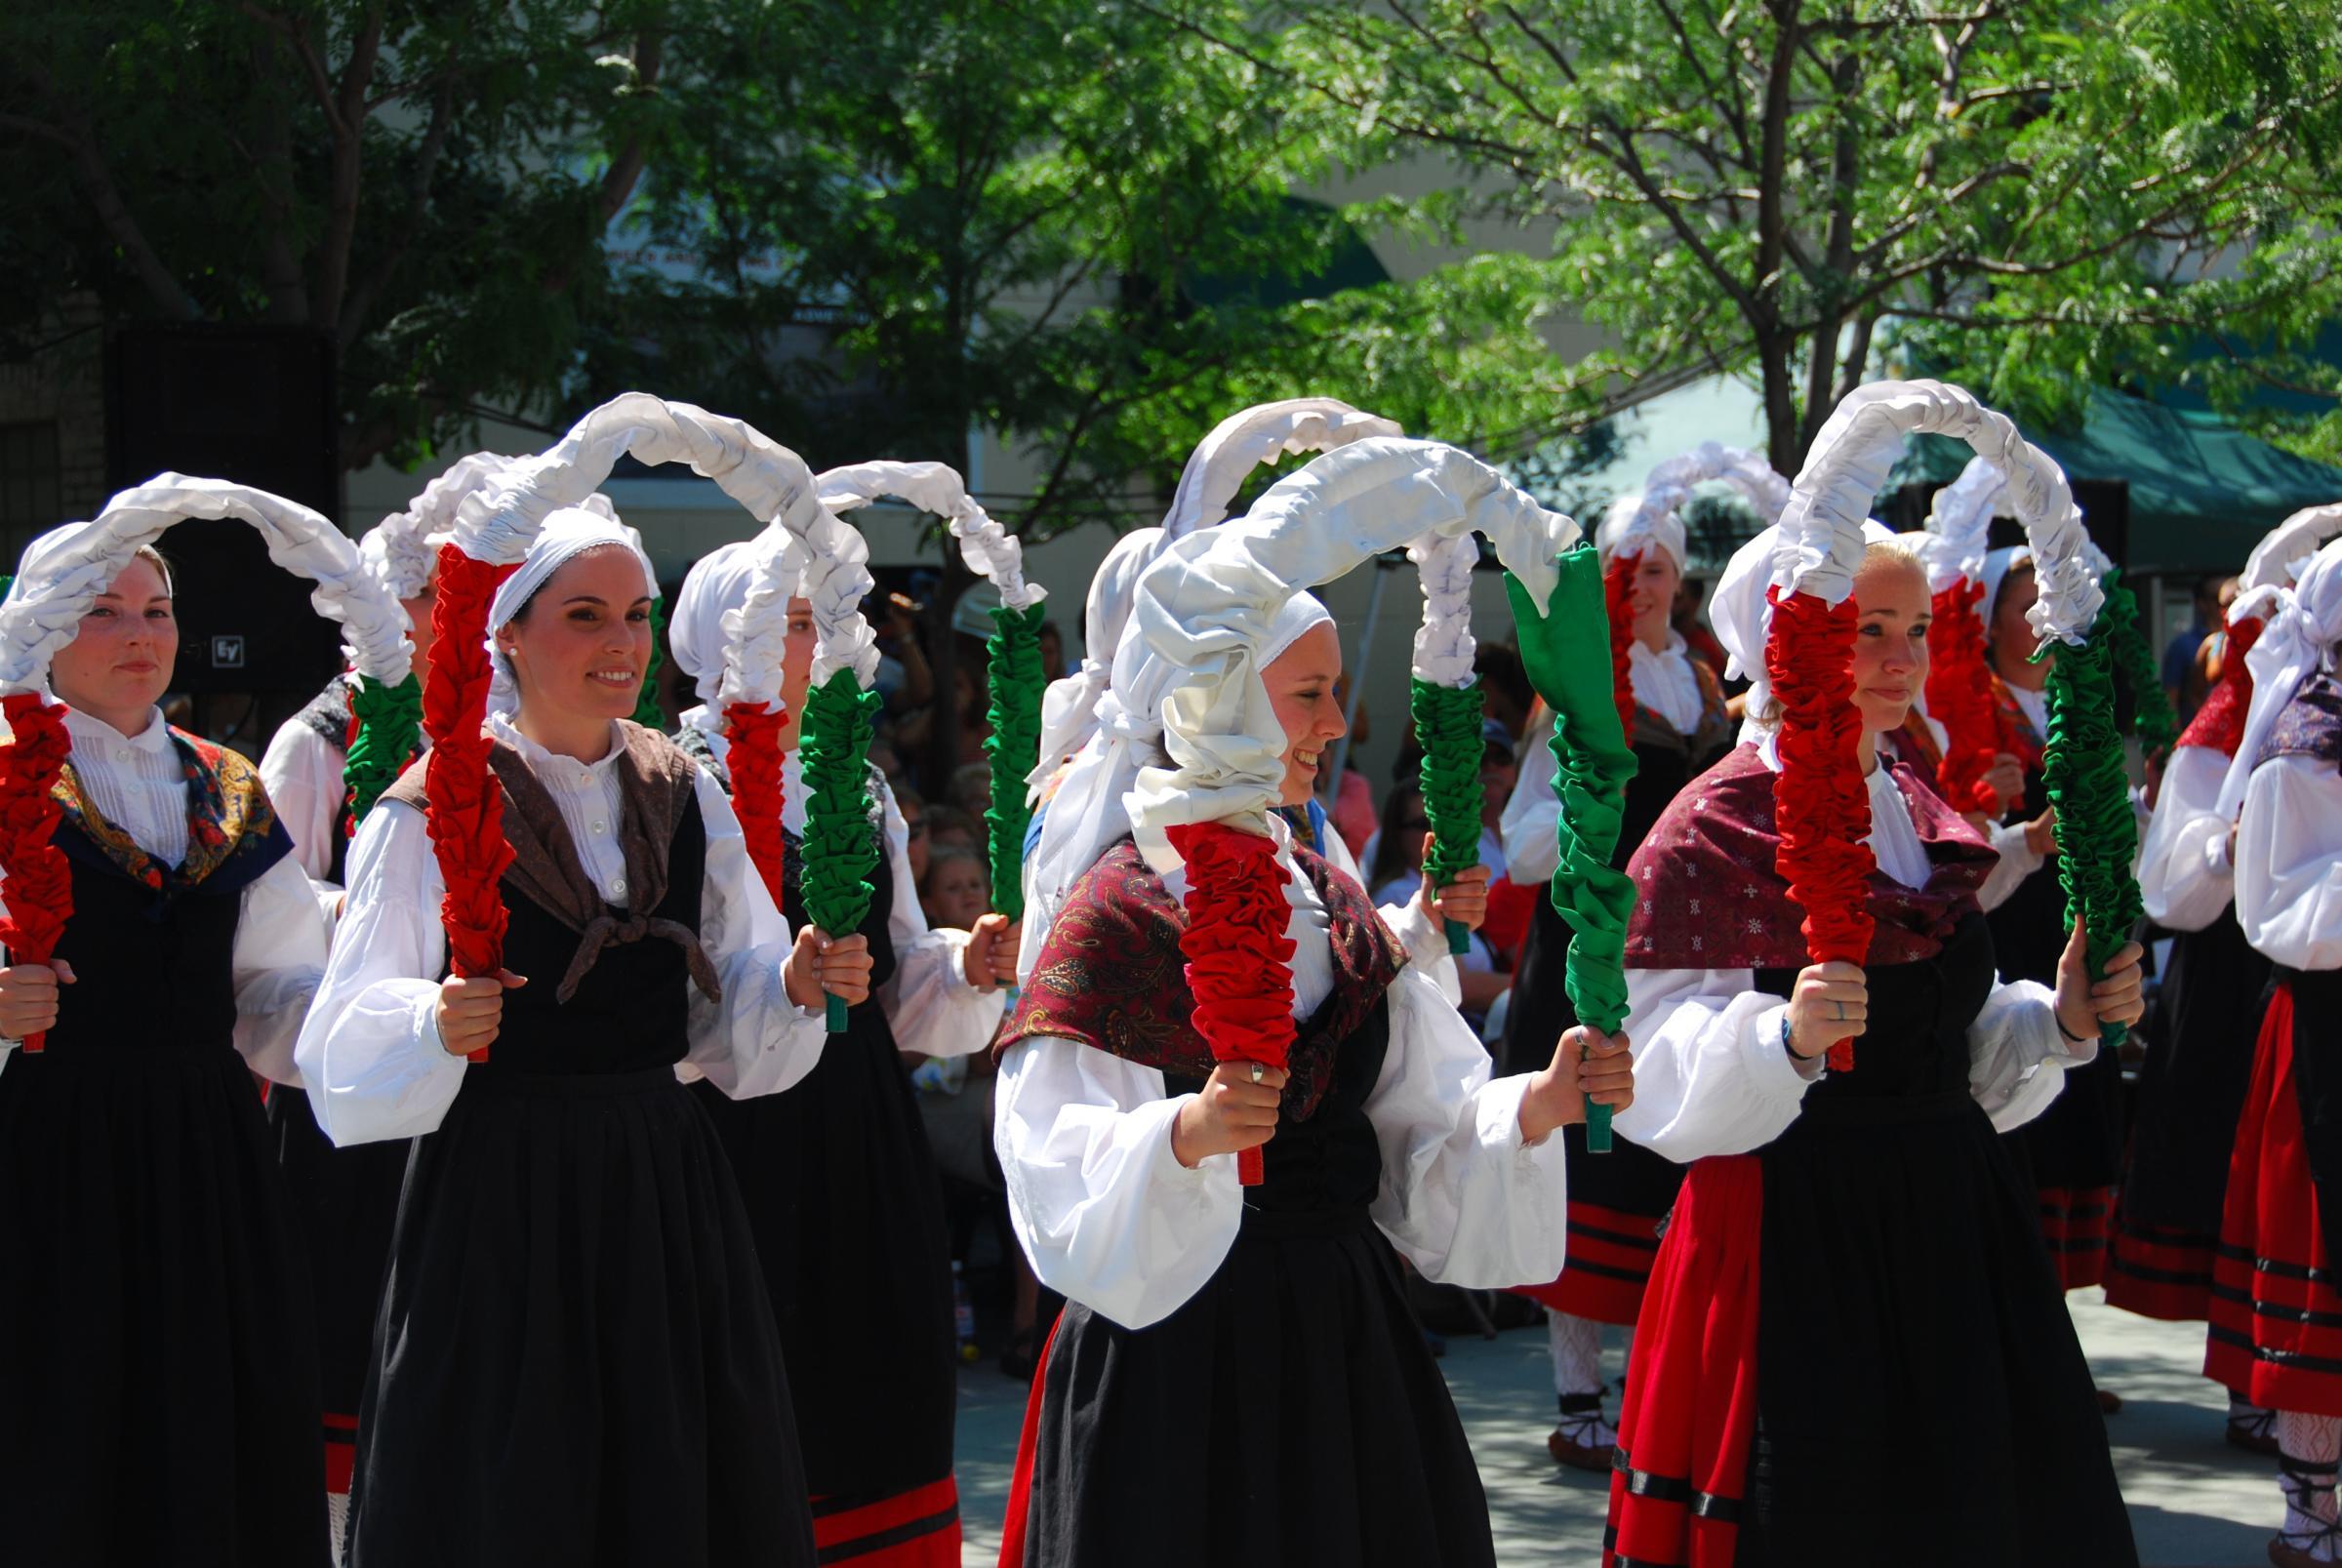 Pelota: Basque Sport Keeps Community Culturally Connected ...